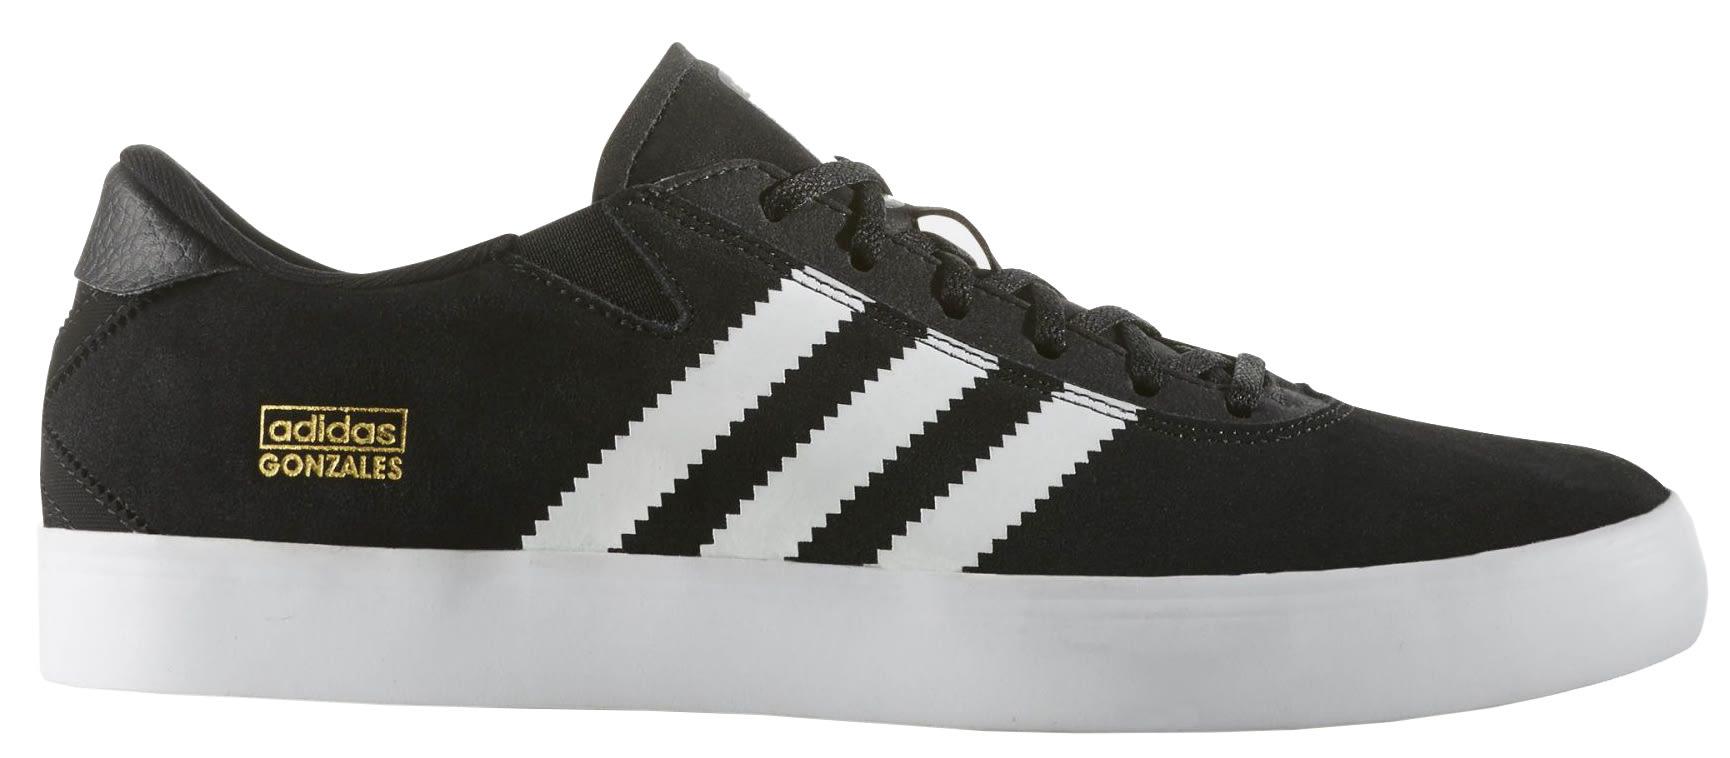 Adidas Gonz Pro Adv Shoes